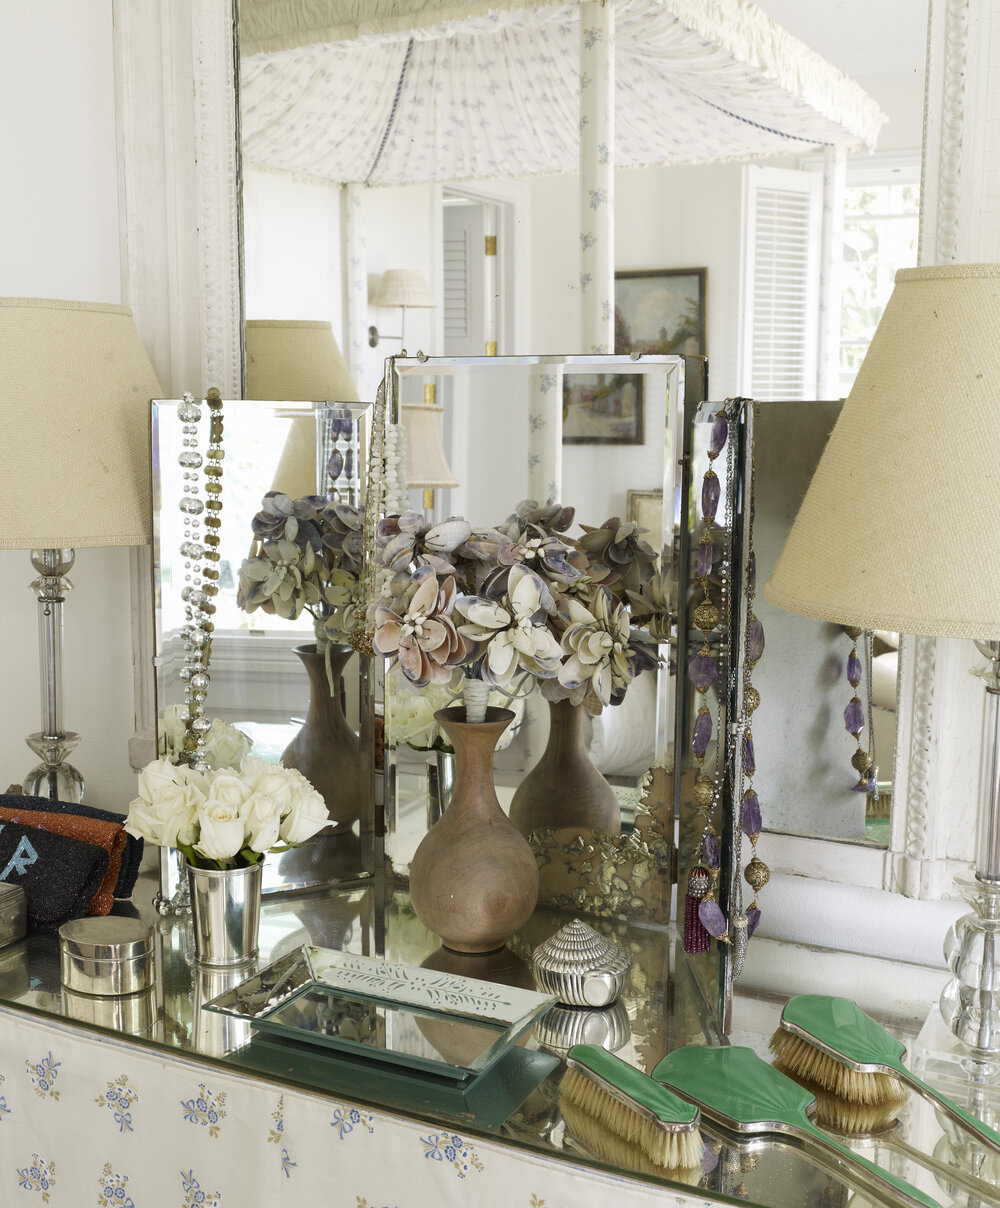 Décor Inspiration | At Home With: Amanda Lindroth, Lyford Cay, Bahamas